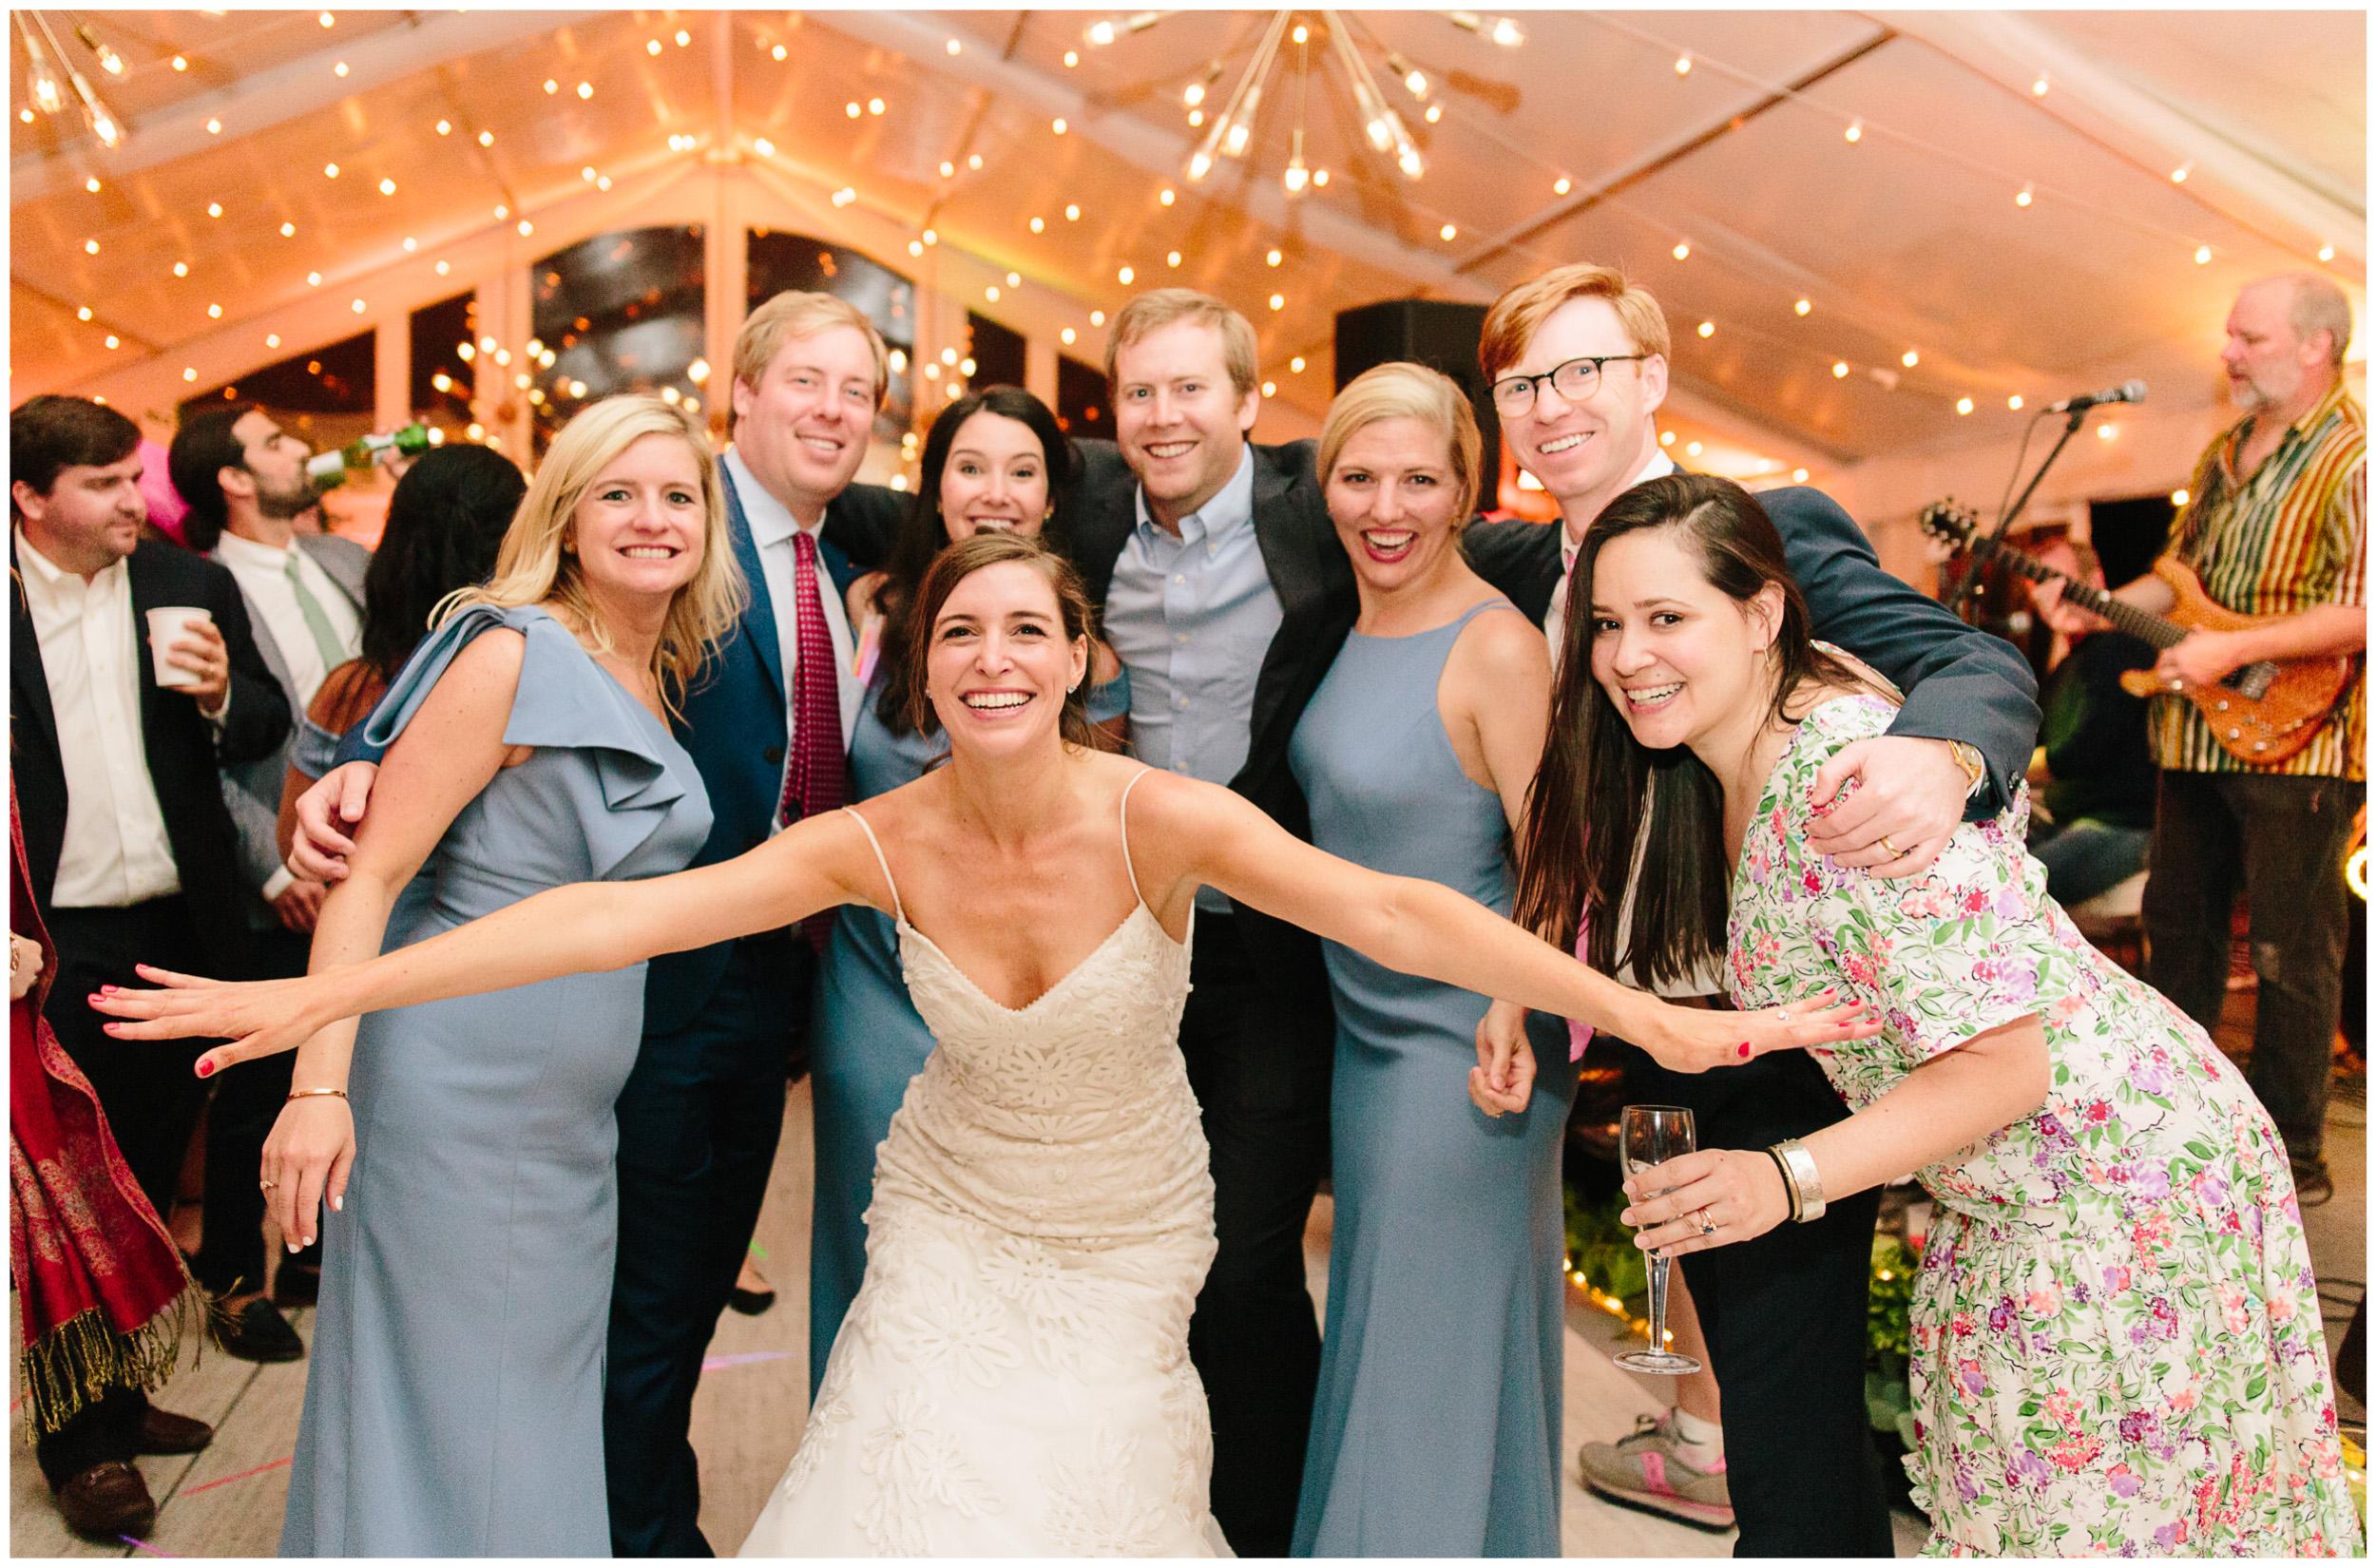 crested_butte_wedding_136.jpg